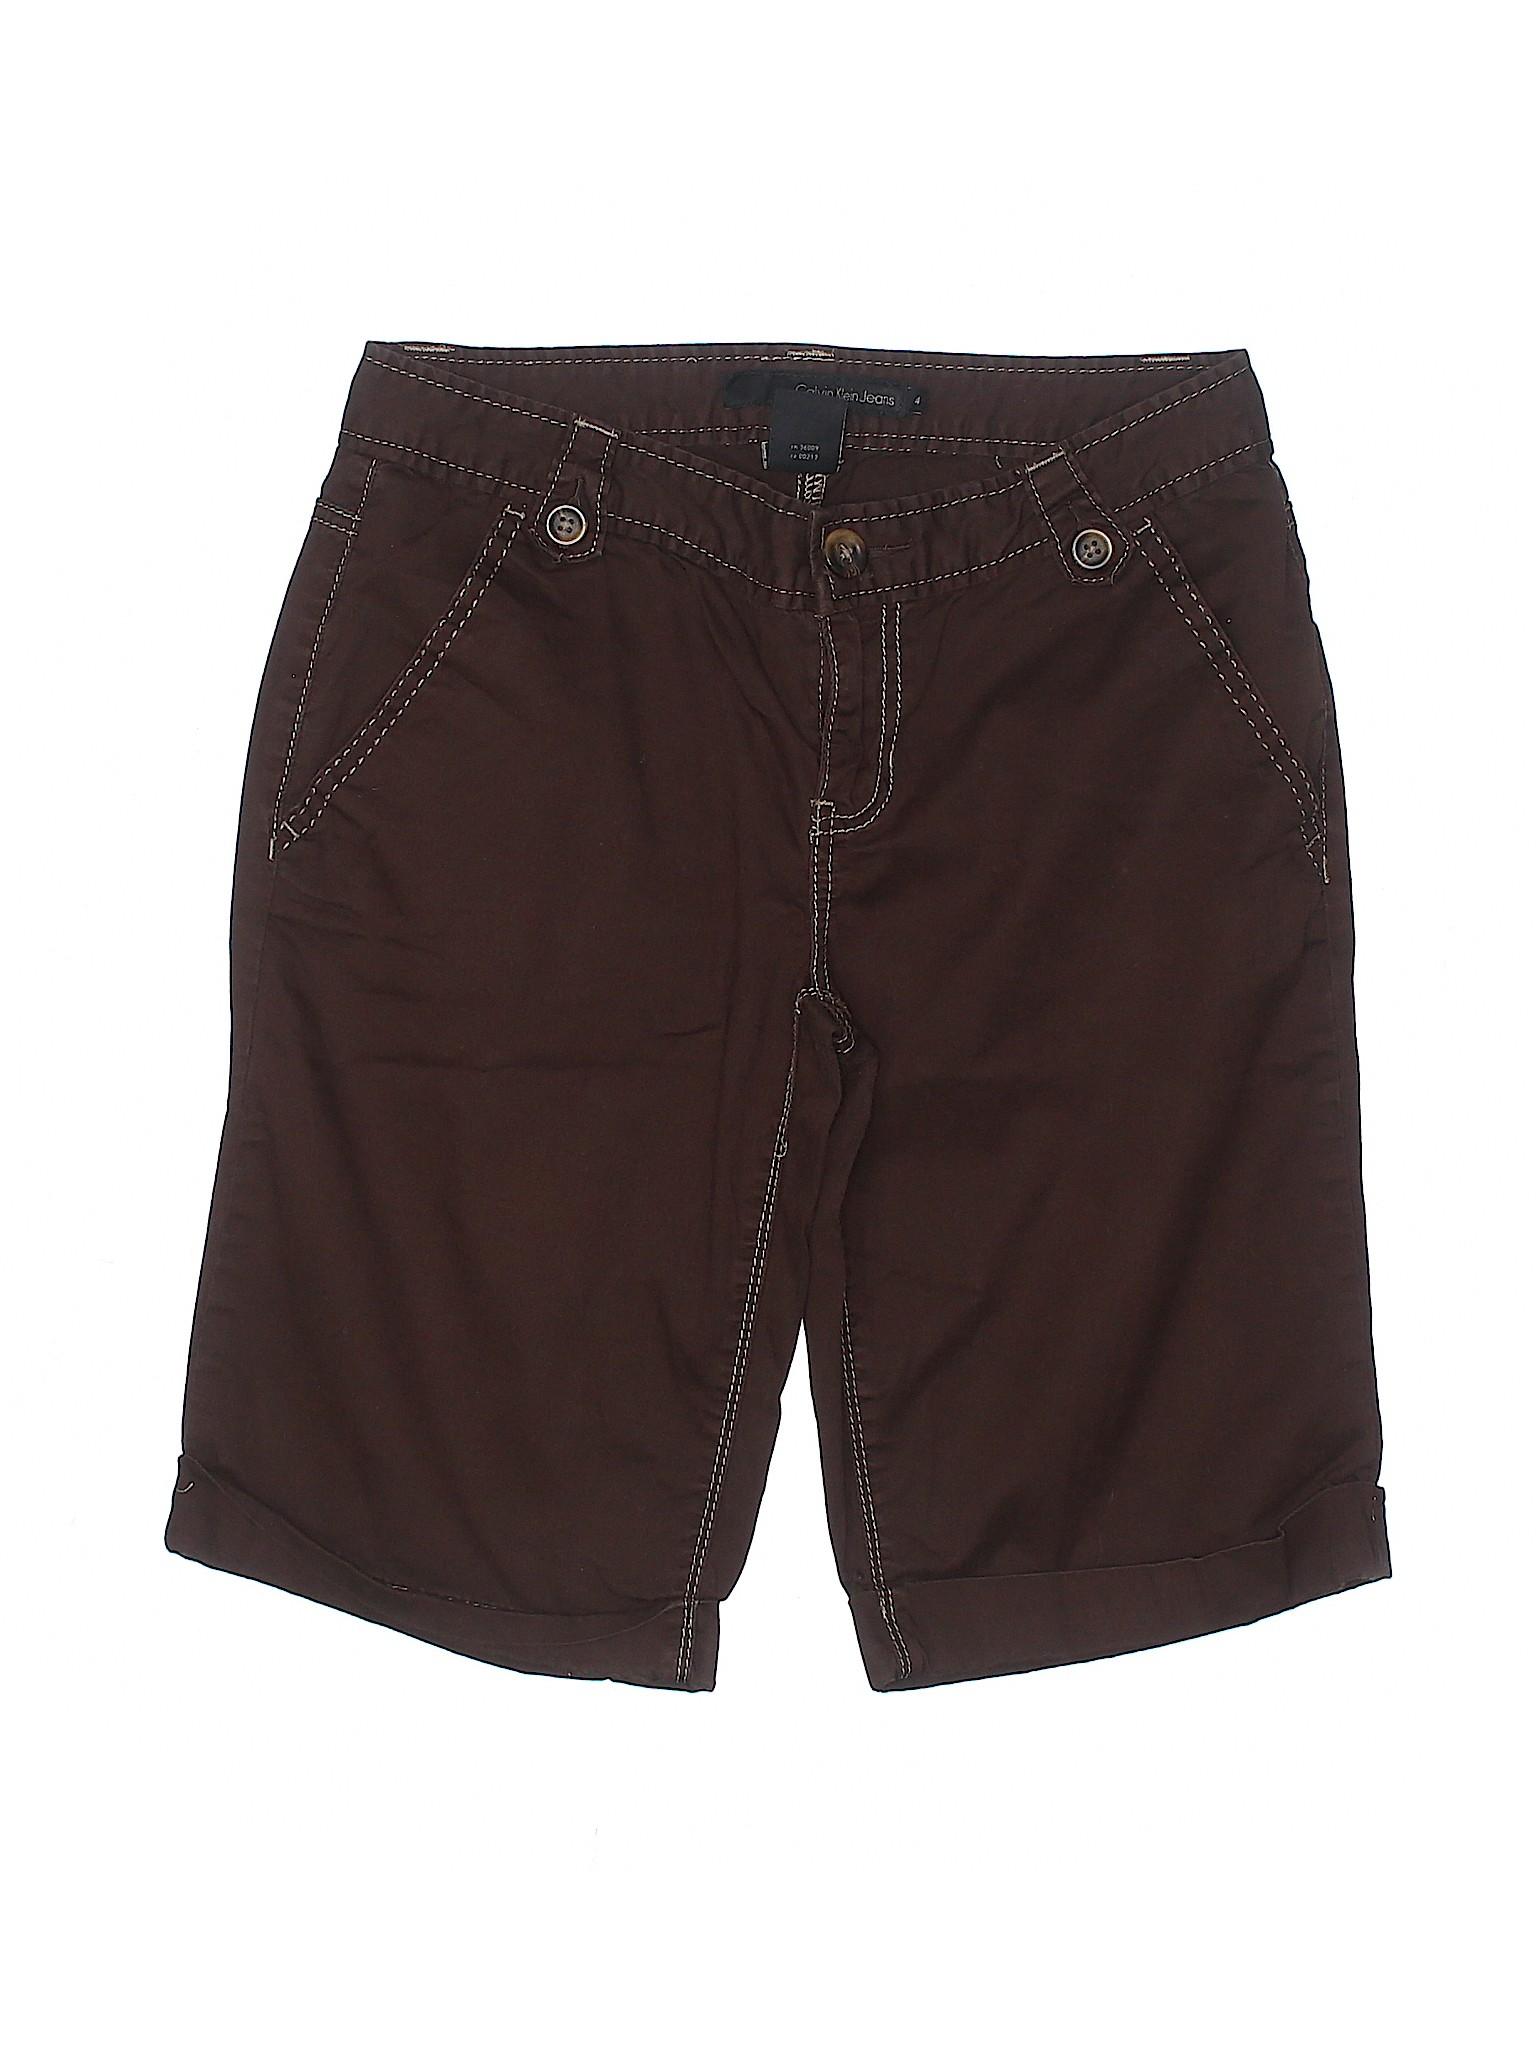 Boutique Shorts Khaki CALVIN KLEIN JEANS rWO74r8P